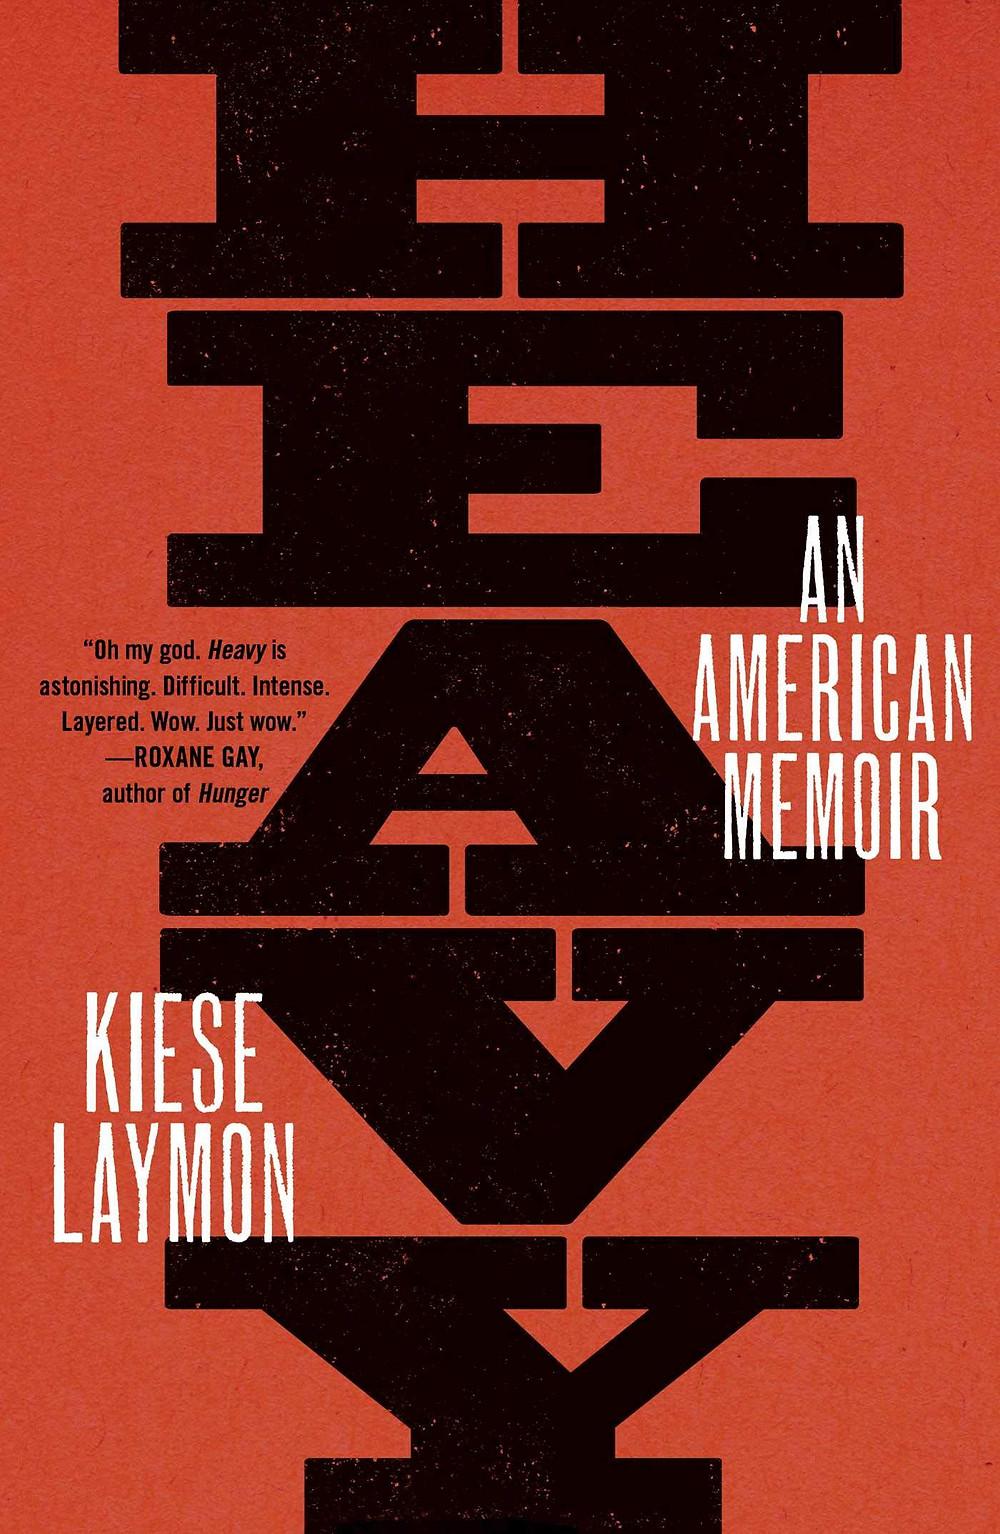 Book Discovery: Heavy: An American Memoir by Kiese Laymon_The BookWalker